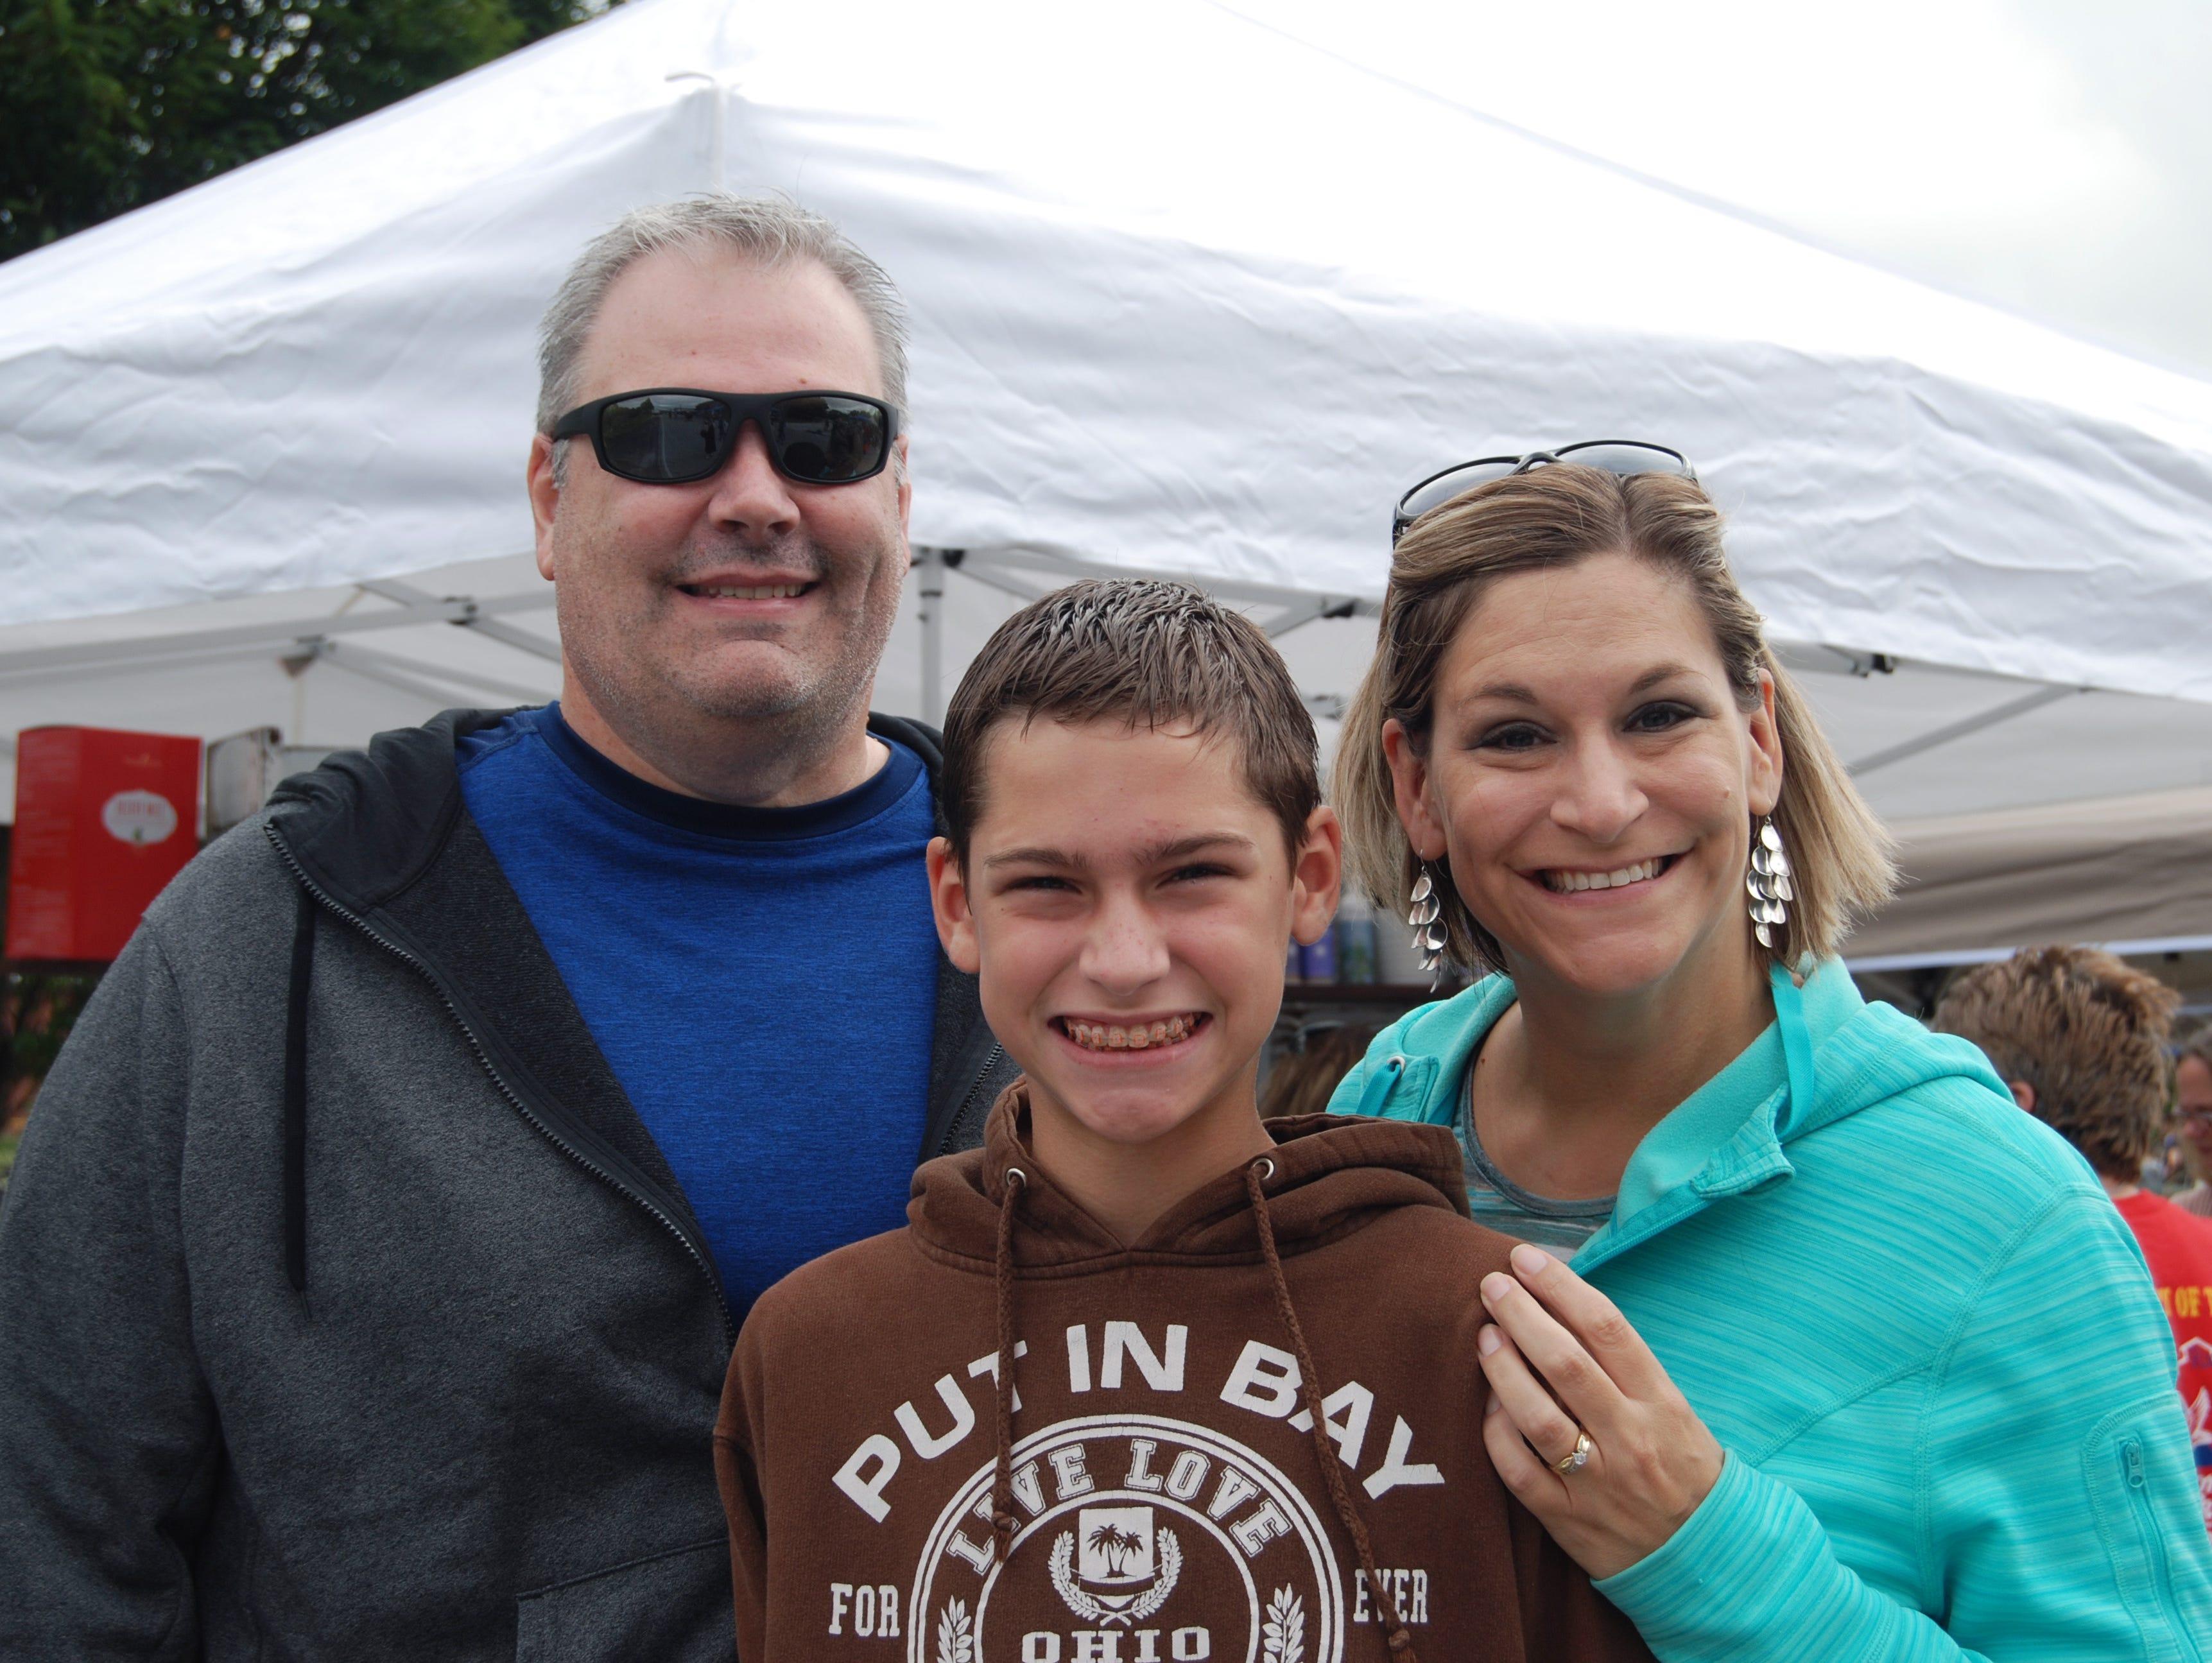 Ryan, Kayden and Renee McClure